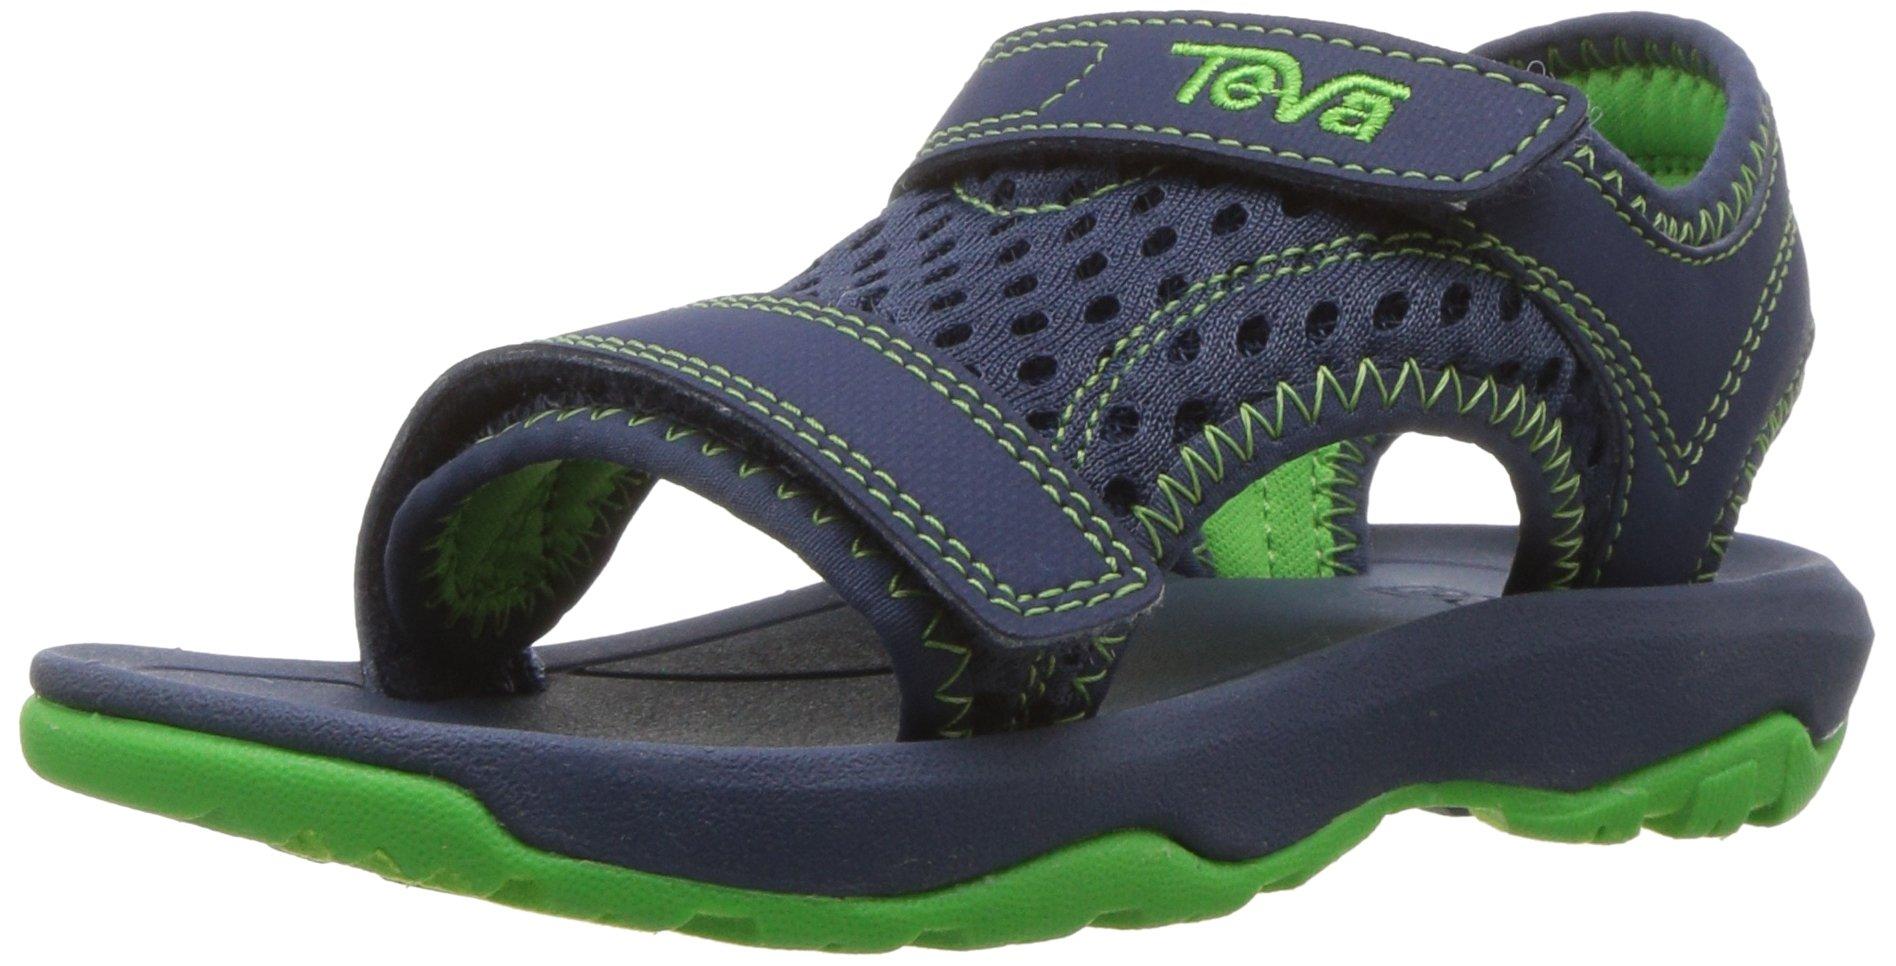 Teva Boys' T Psyclone XLT Sport Sandal, Navy, 8 M US Toddler by Teva